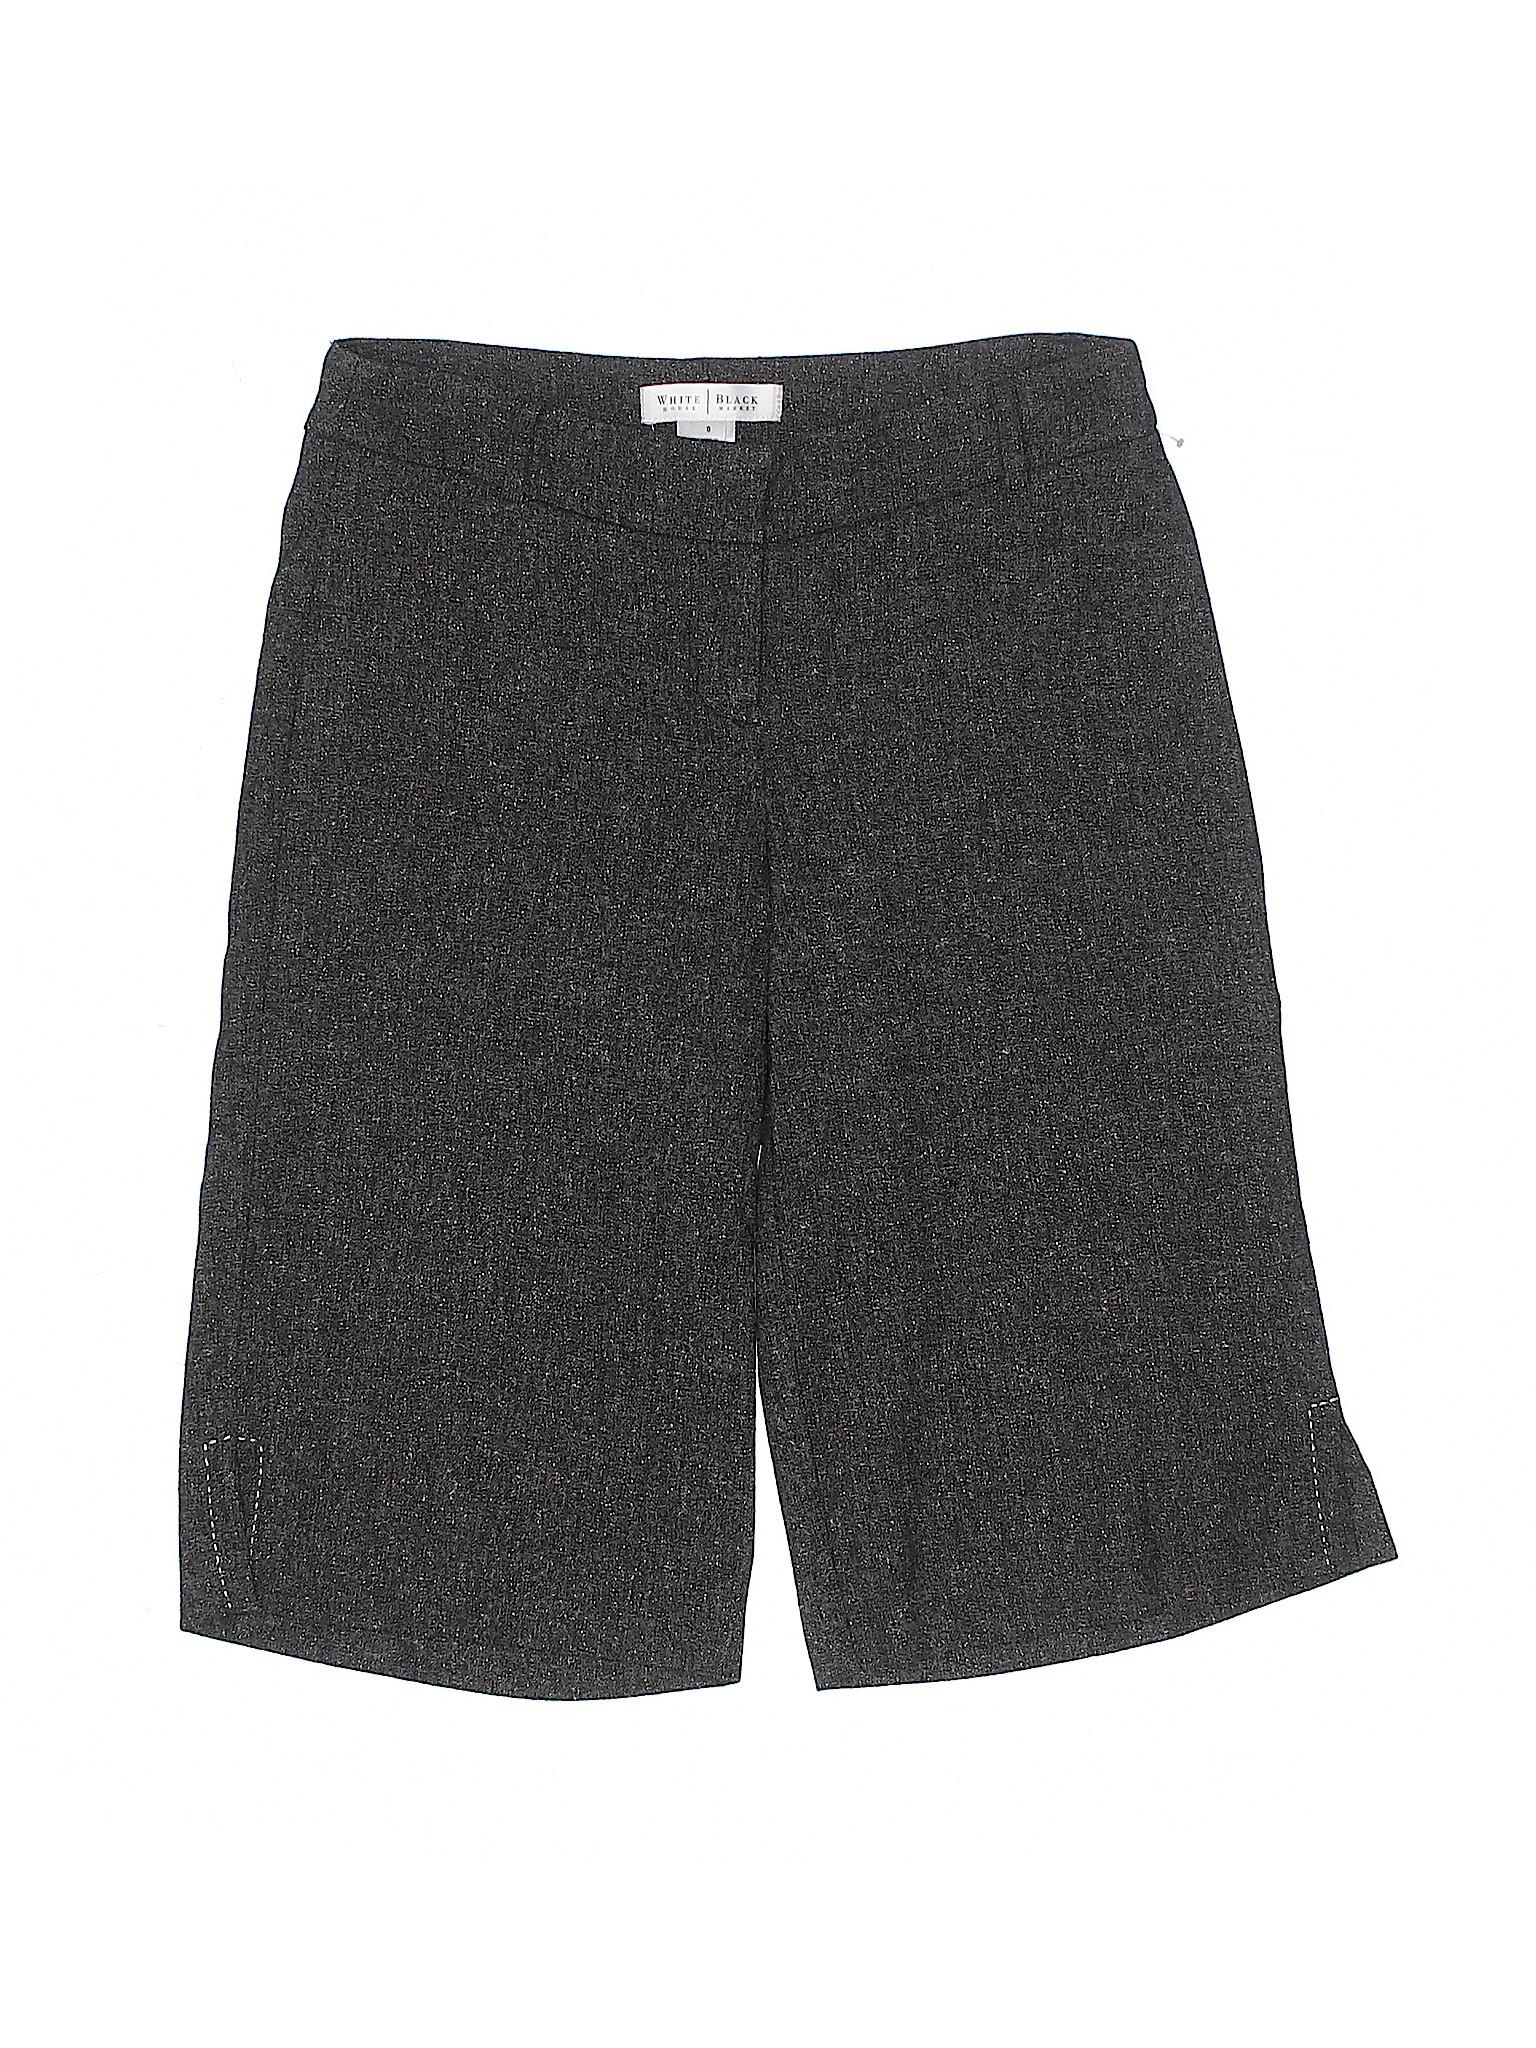 Black Boutique White Shorts Dressy Market House ZCYRHq